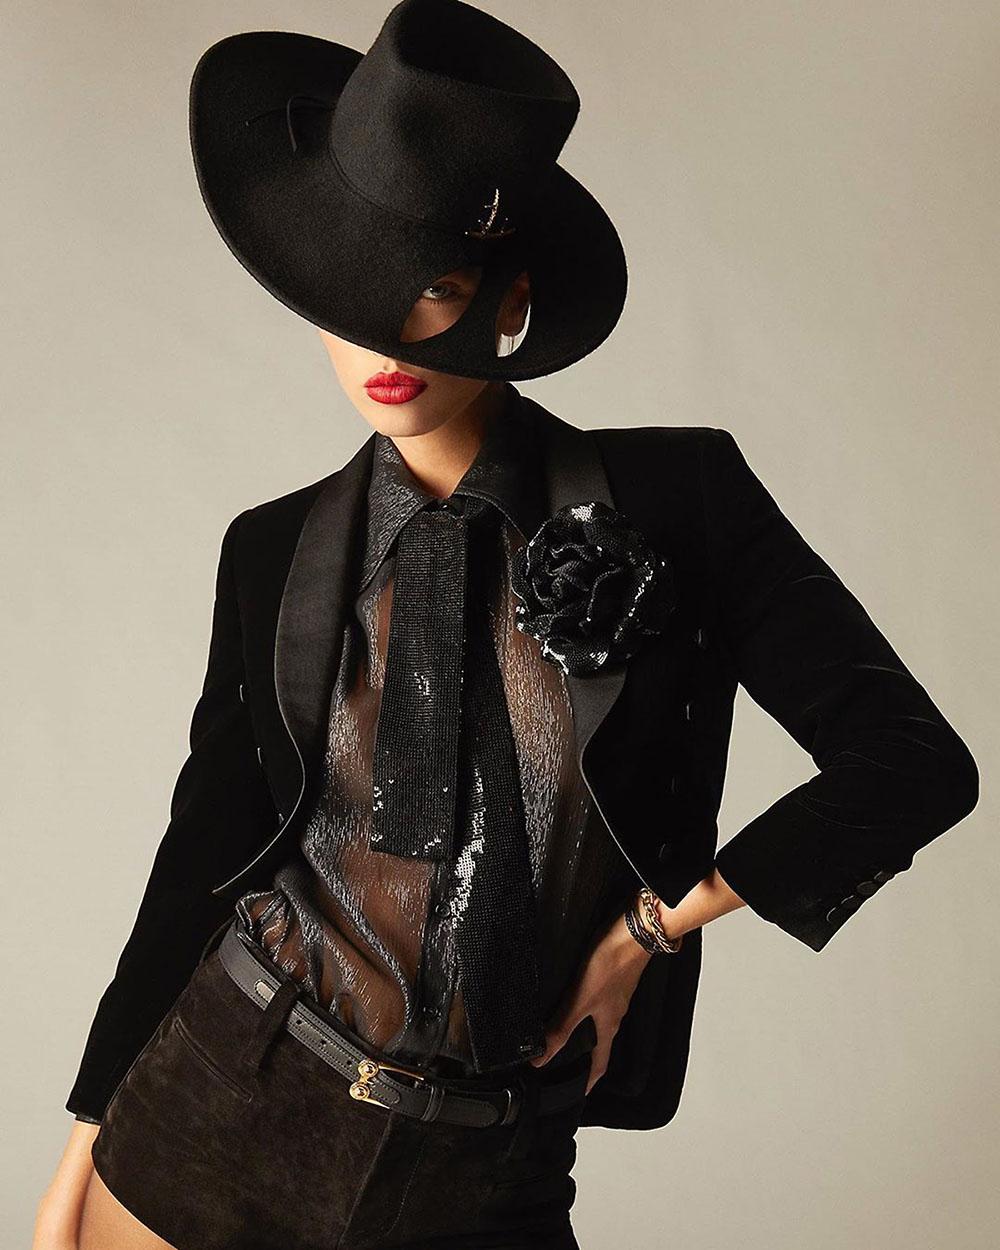 Daphne Groeneveld by Walter Chin for Vogue Hong Kong April 2020